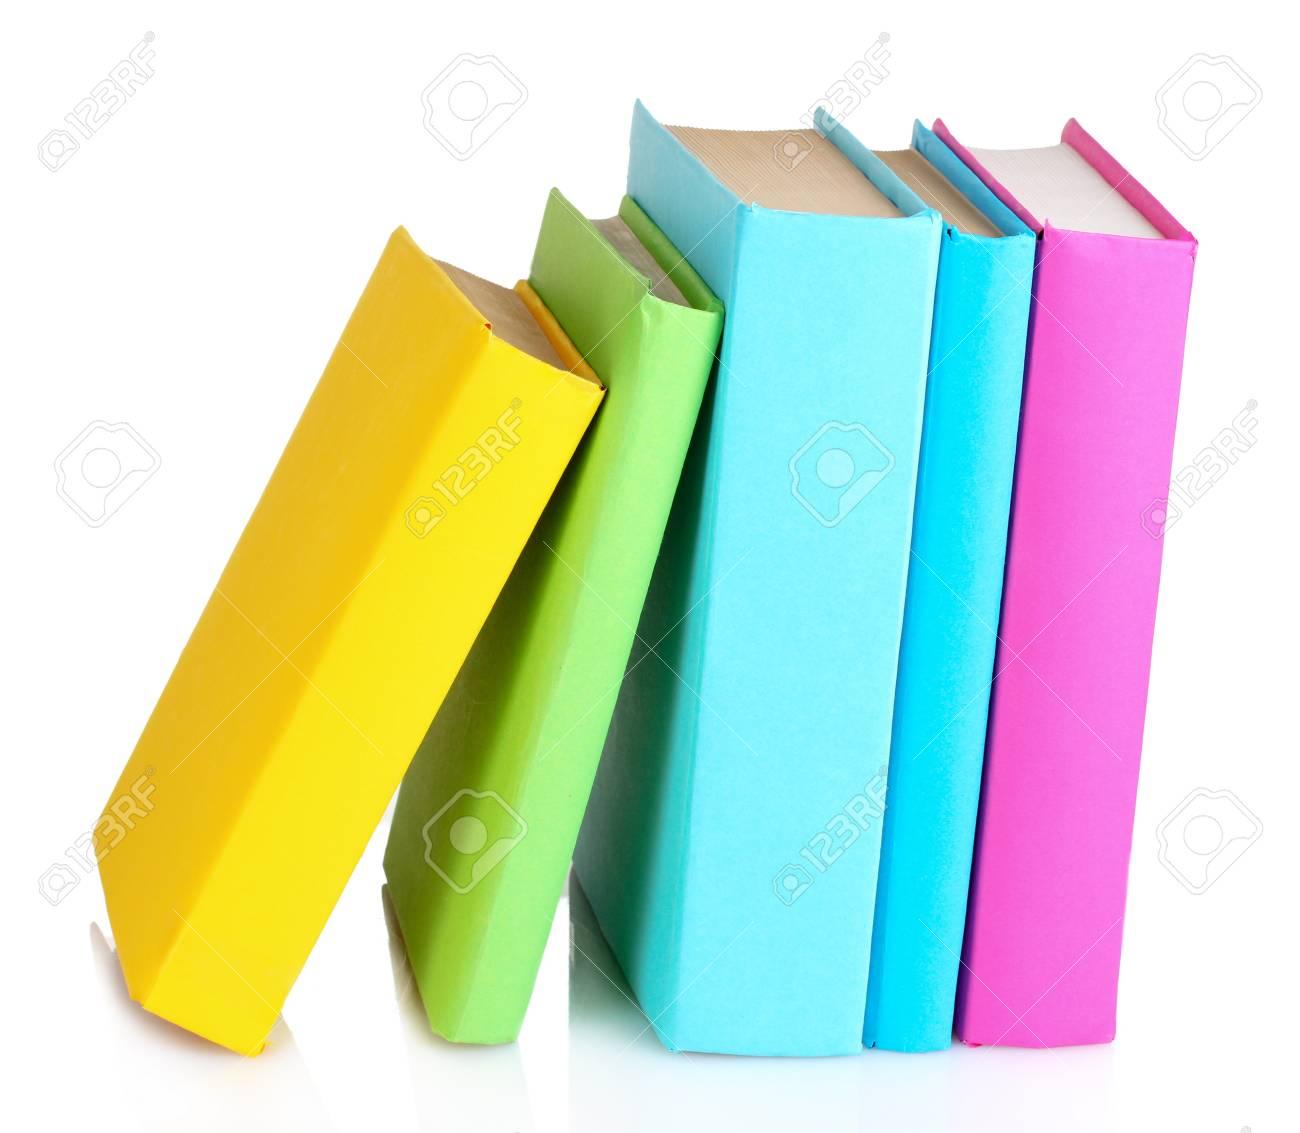 Books isolated on white Stock Photo - 10354095